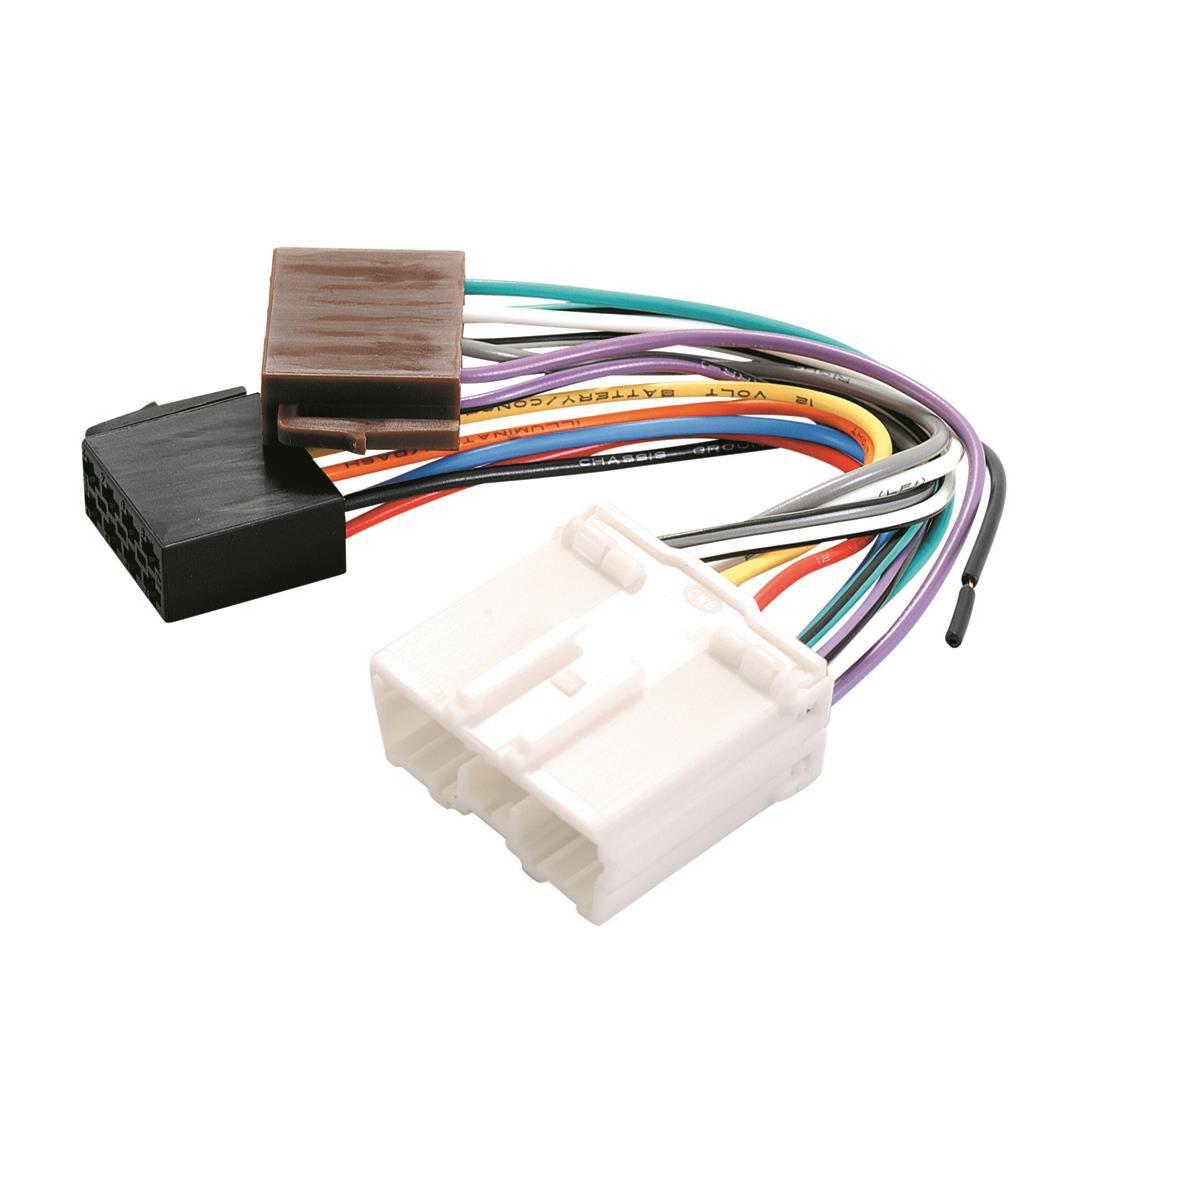 wiring harness app0111 to suit most mitsubishi 1 plug type rh supercheapauto com au mitsubishi iso wiring harness mitsubishi outlander trailer wiring harness